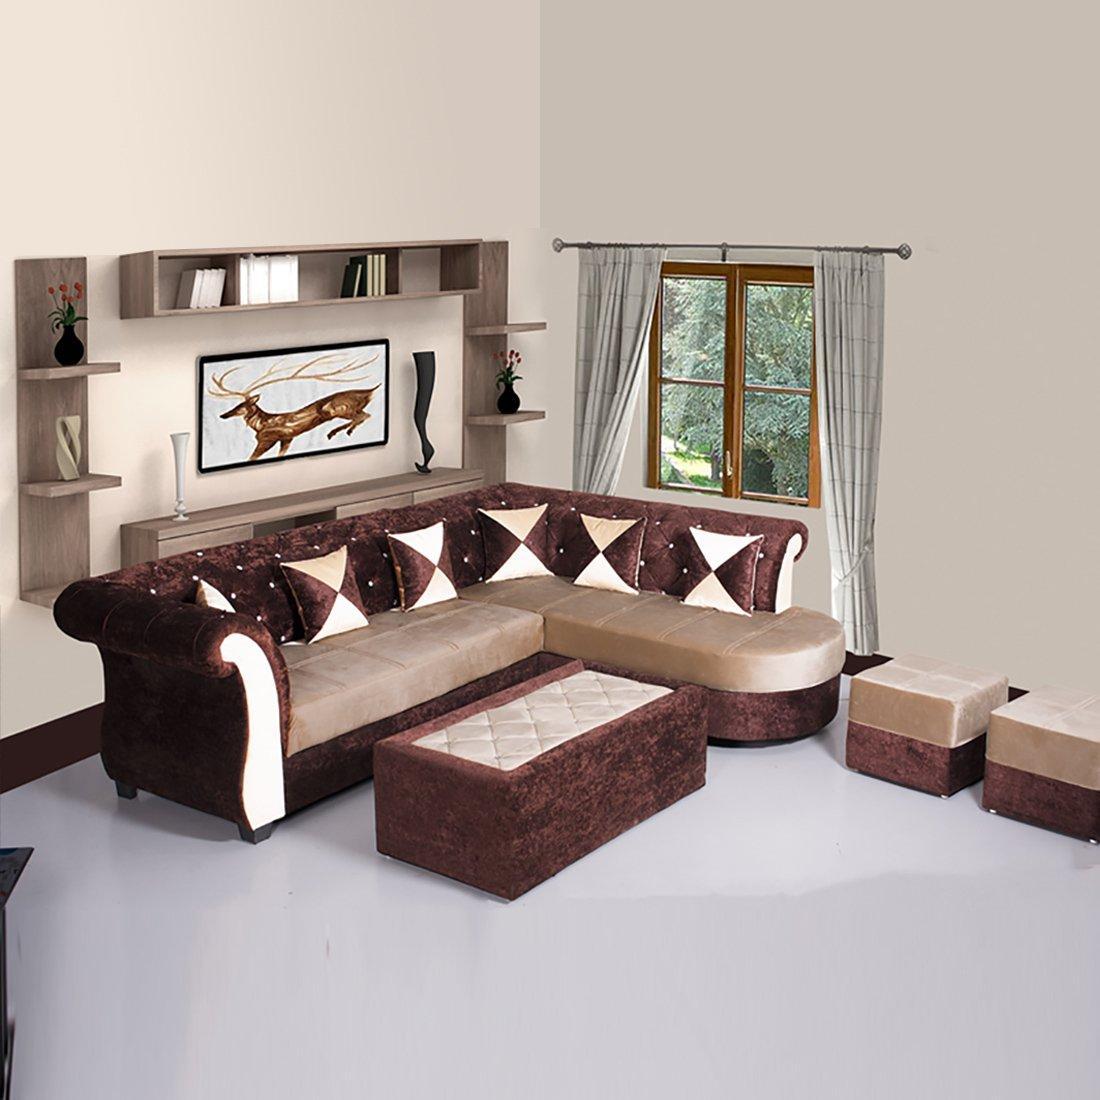 Bharat Lifestyle Dl Diamond Fabric, Diamond Furniture Living Room Sets